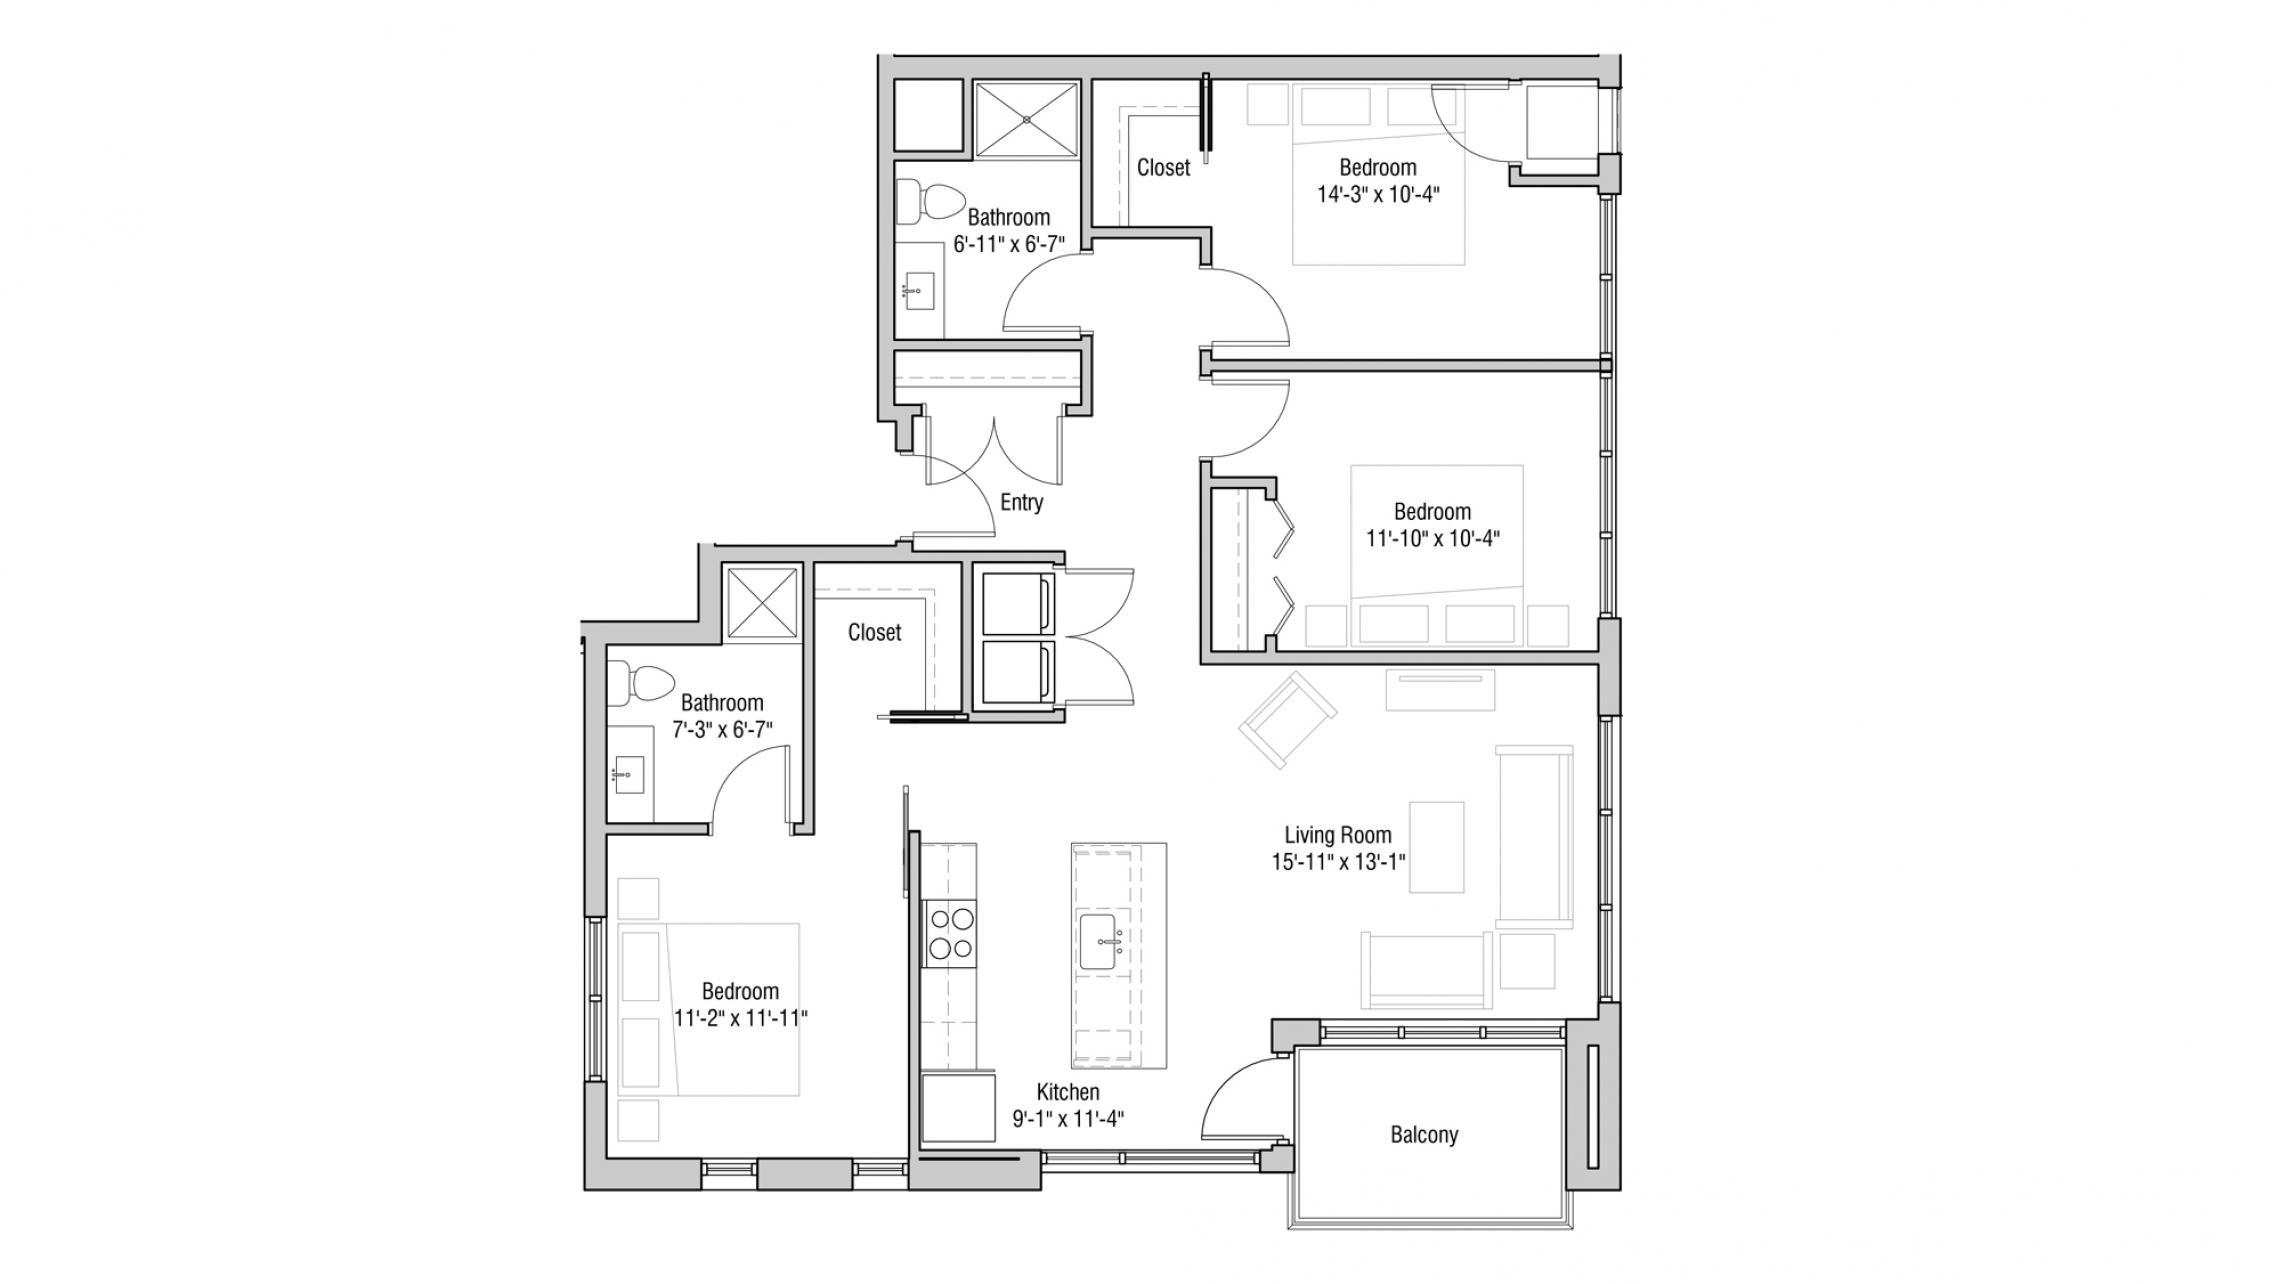 ULI Quarter Row 101 - Three Bedroom, Two Bathroom